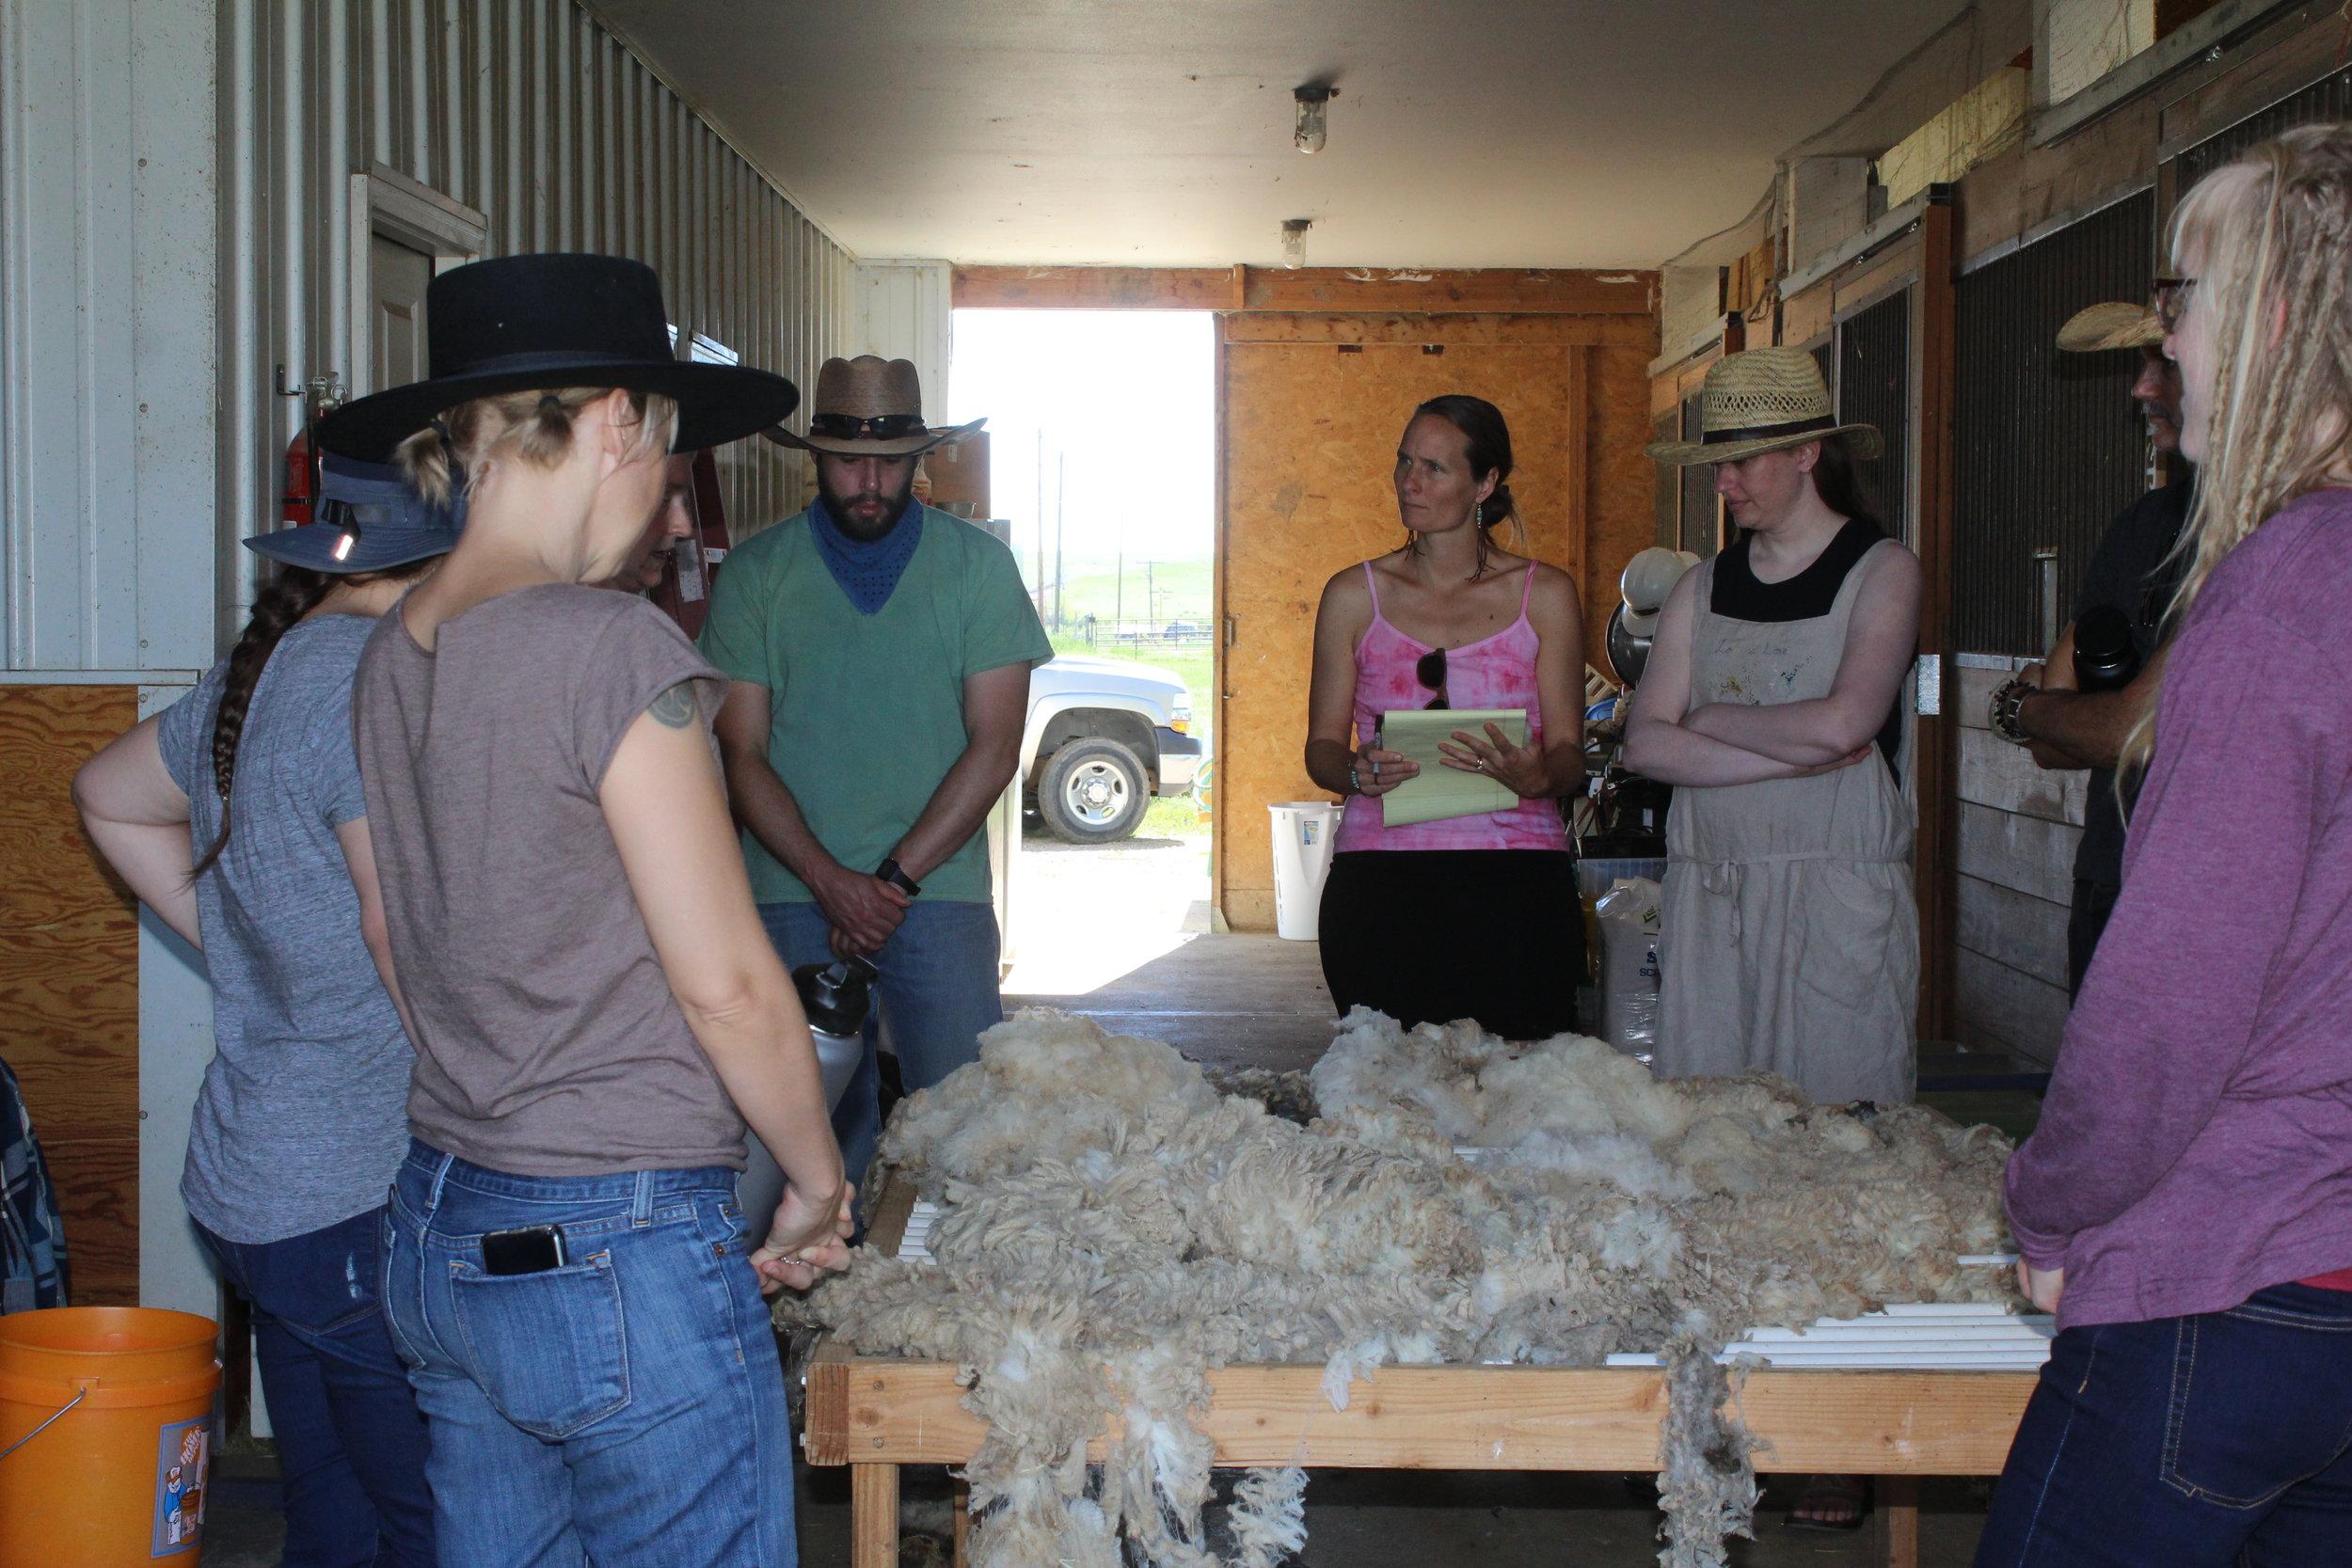 Skirting fleece